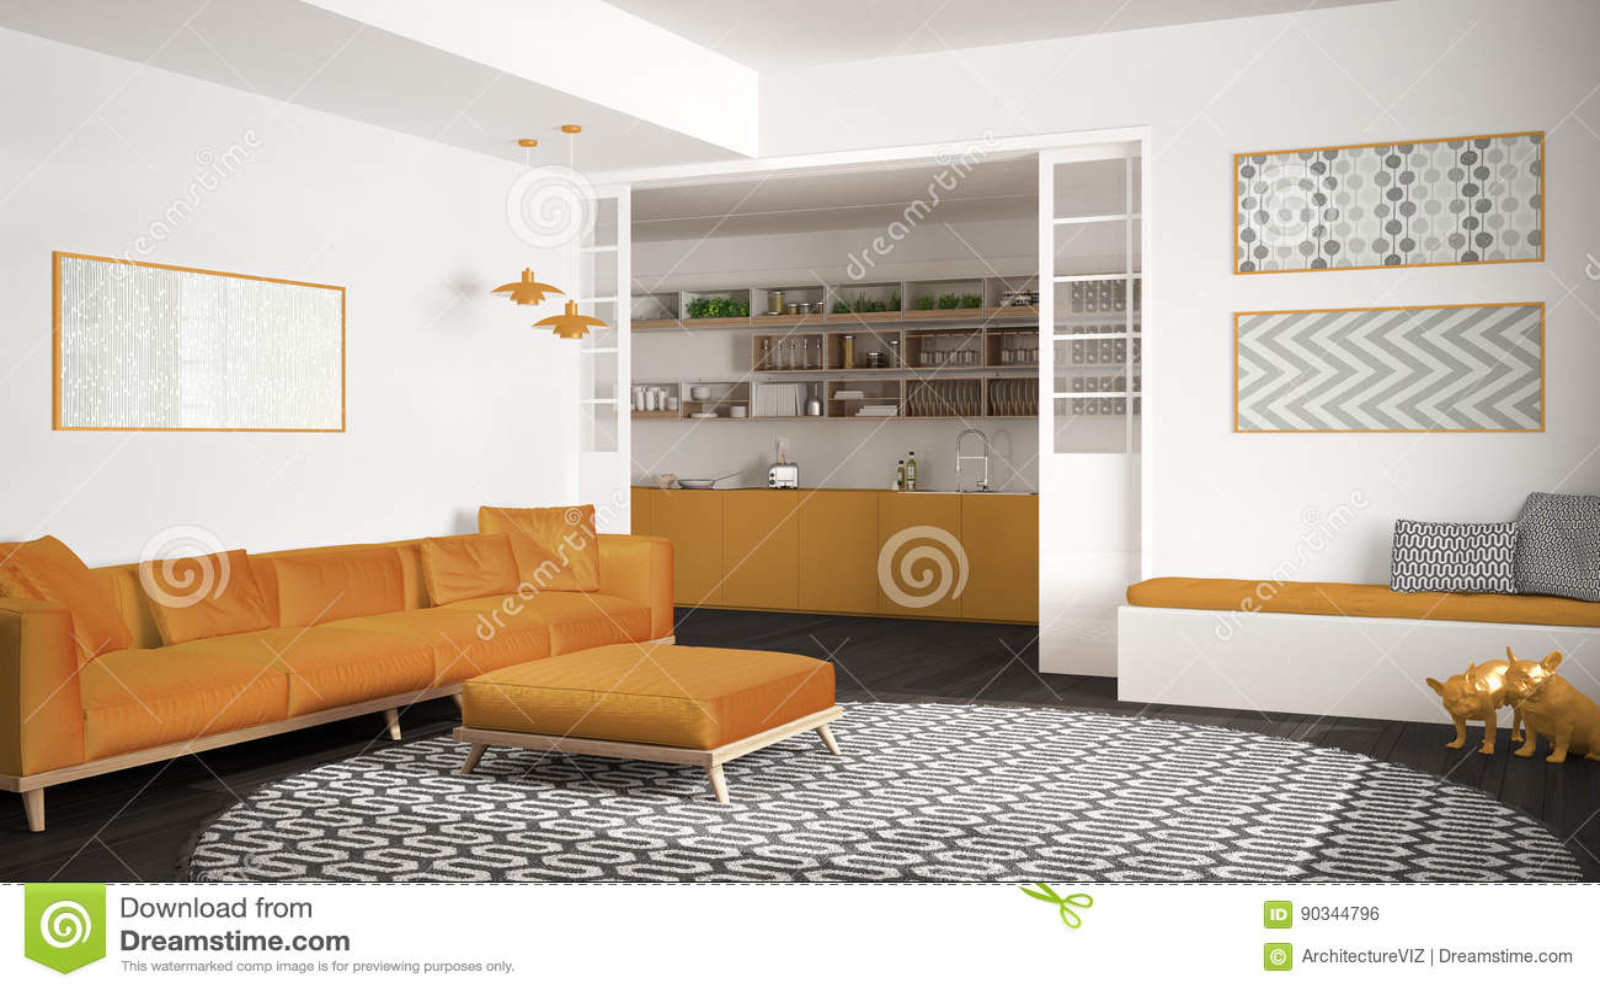 yellow kitchen rugs roll about cart 有沙发 大圆的地毯和厨房的最低纲领派客厅背景 灰色和黄色现代室内设计 灰色和黄色现代内部的